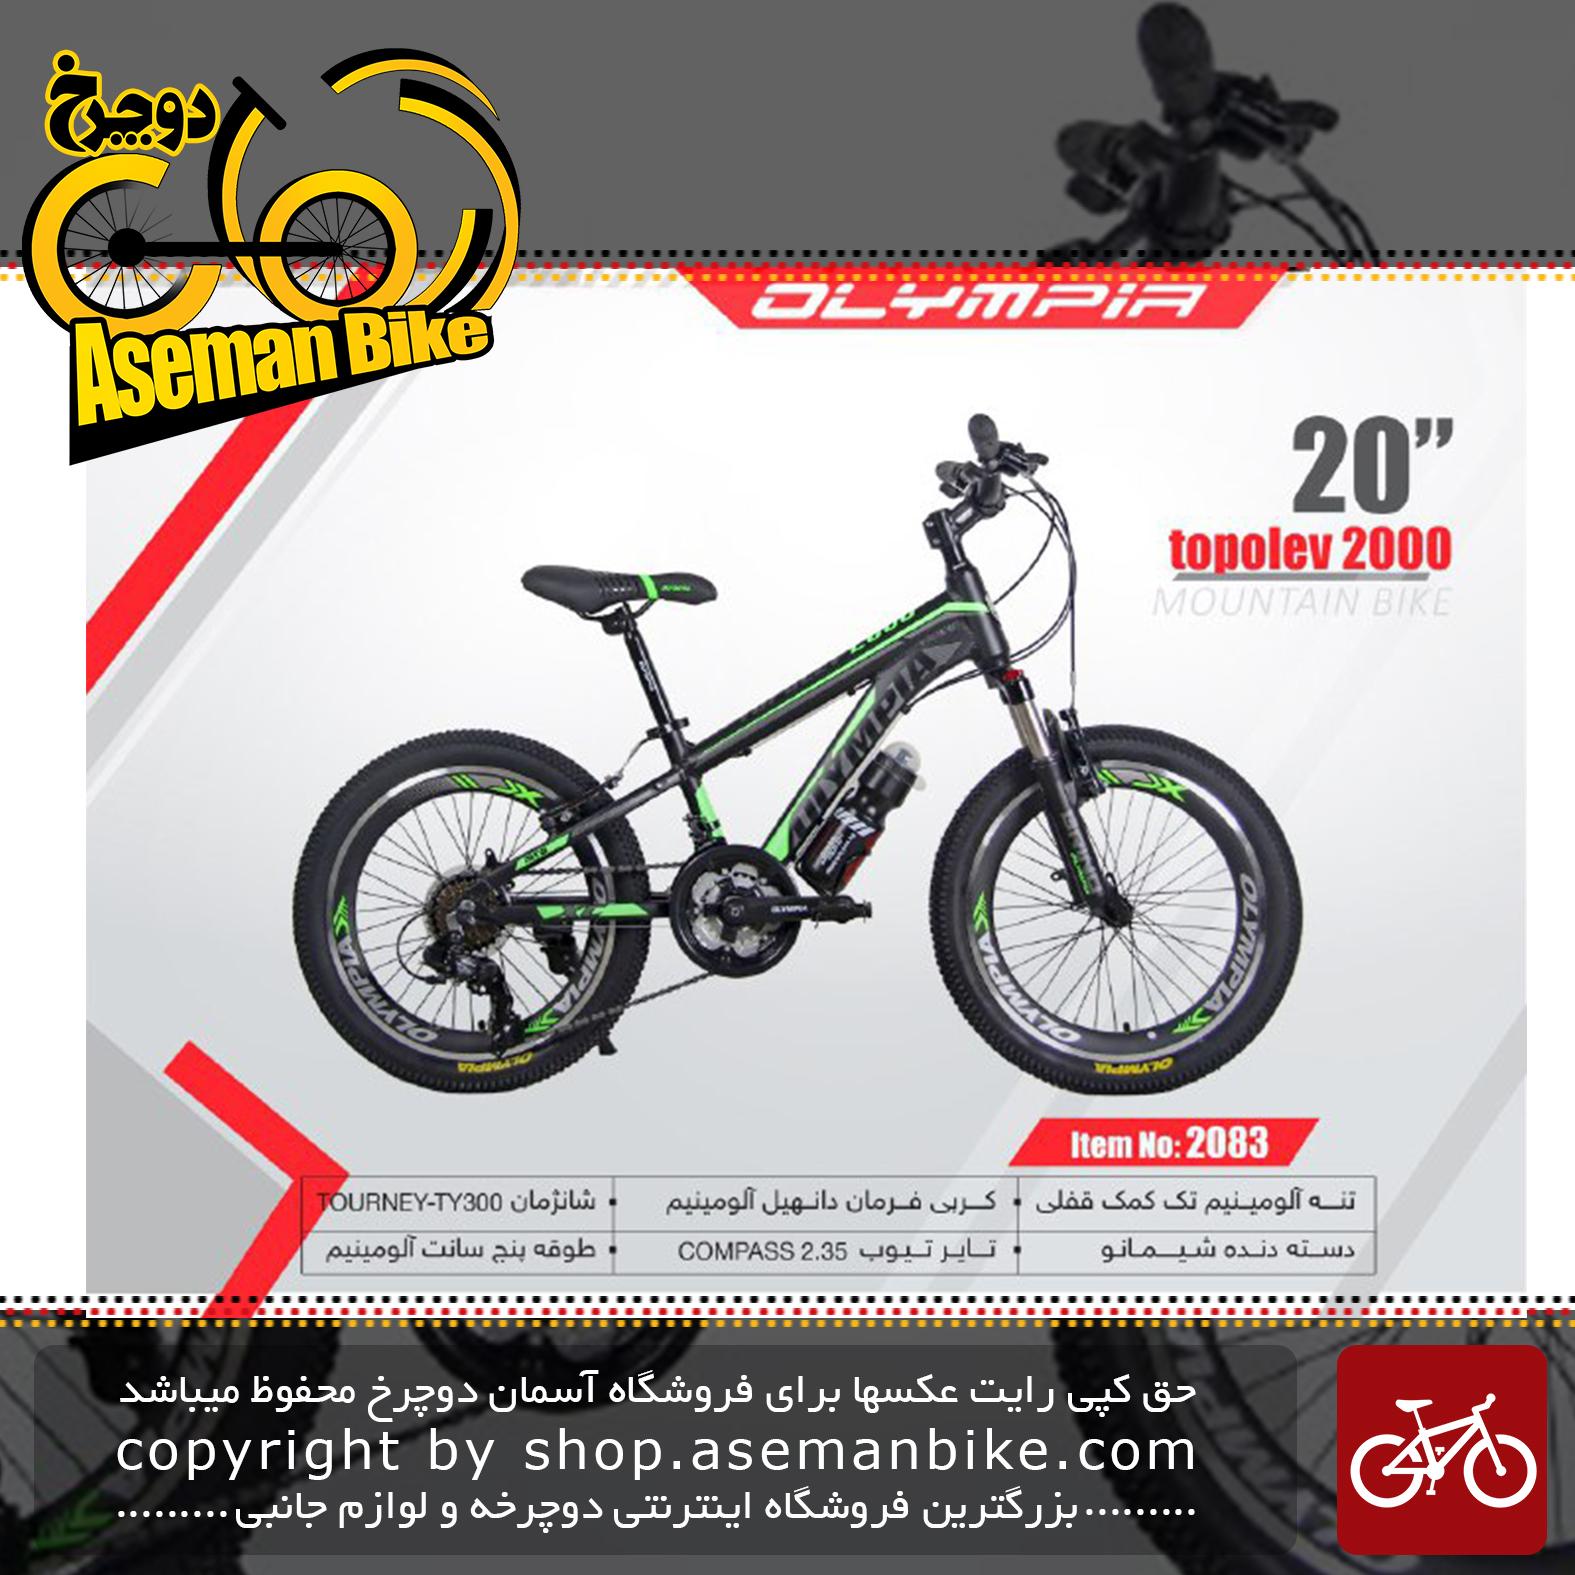 دوچرخه کوهستان المپیا سایز 20مدل تاپولو2000 2000 OLYMPIA SIZE 20 TOPOLEV